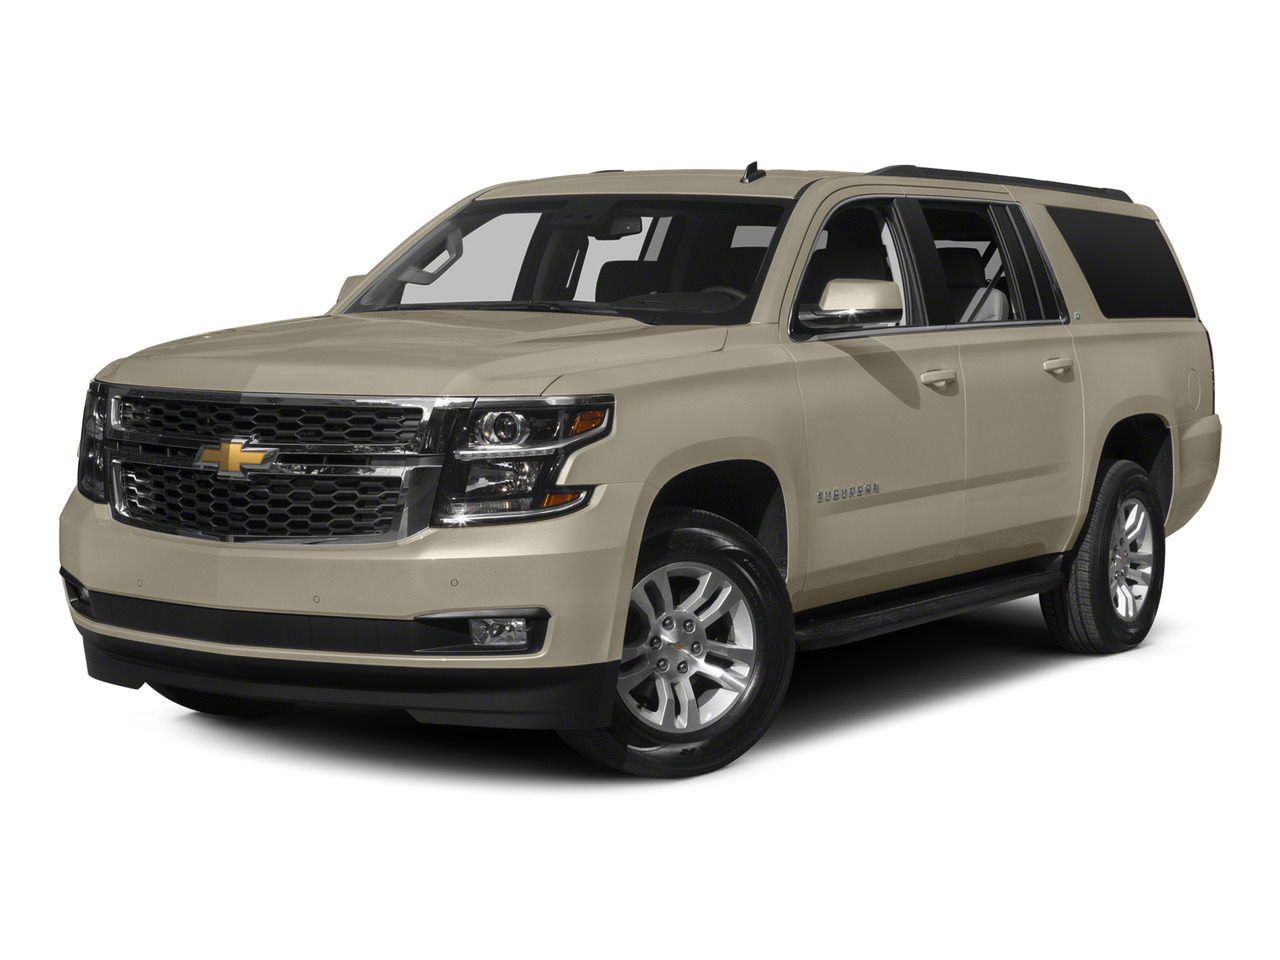 2015 Chevrolet Suburban LTZ Wake Forest NC